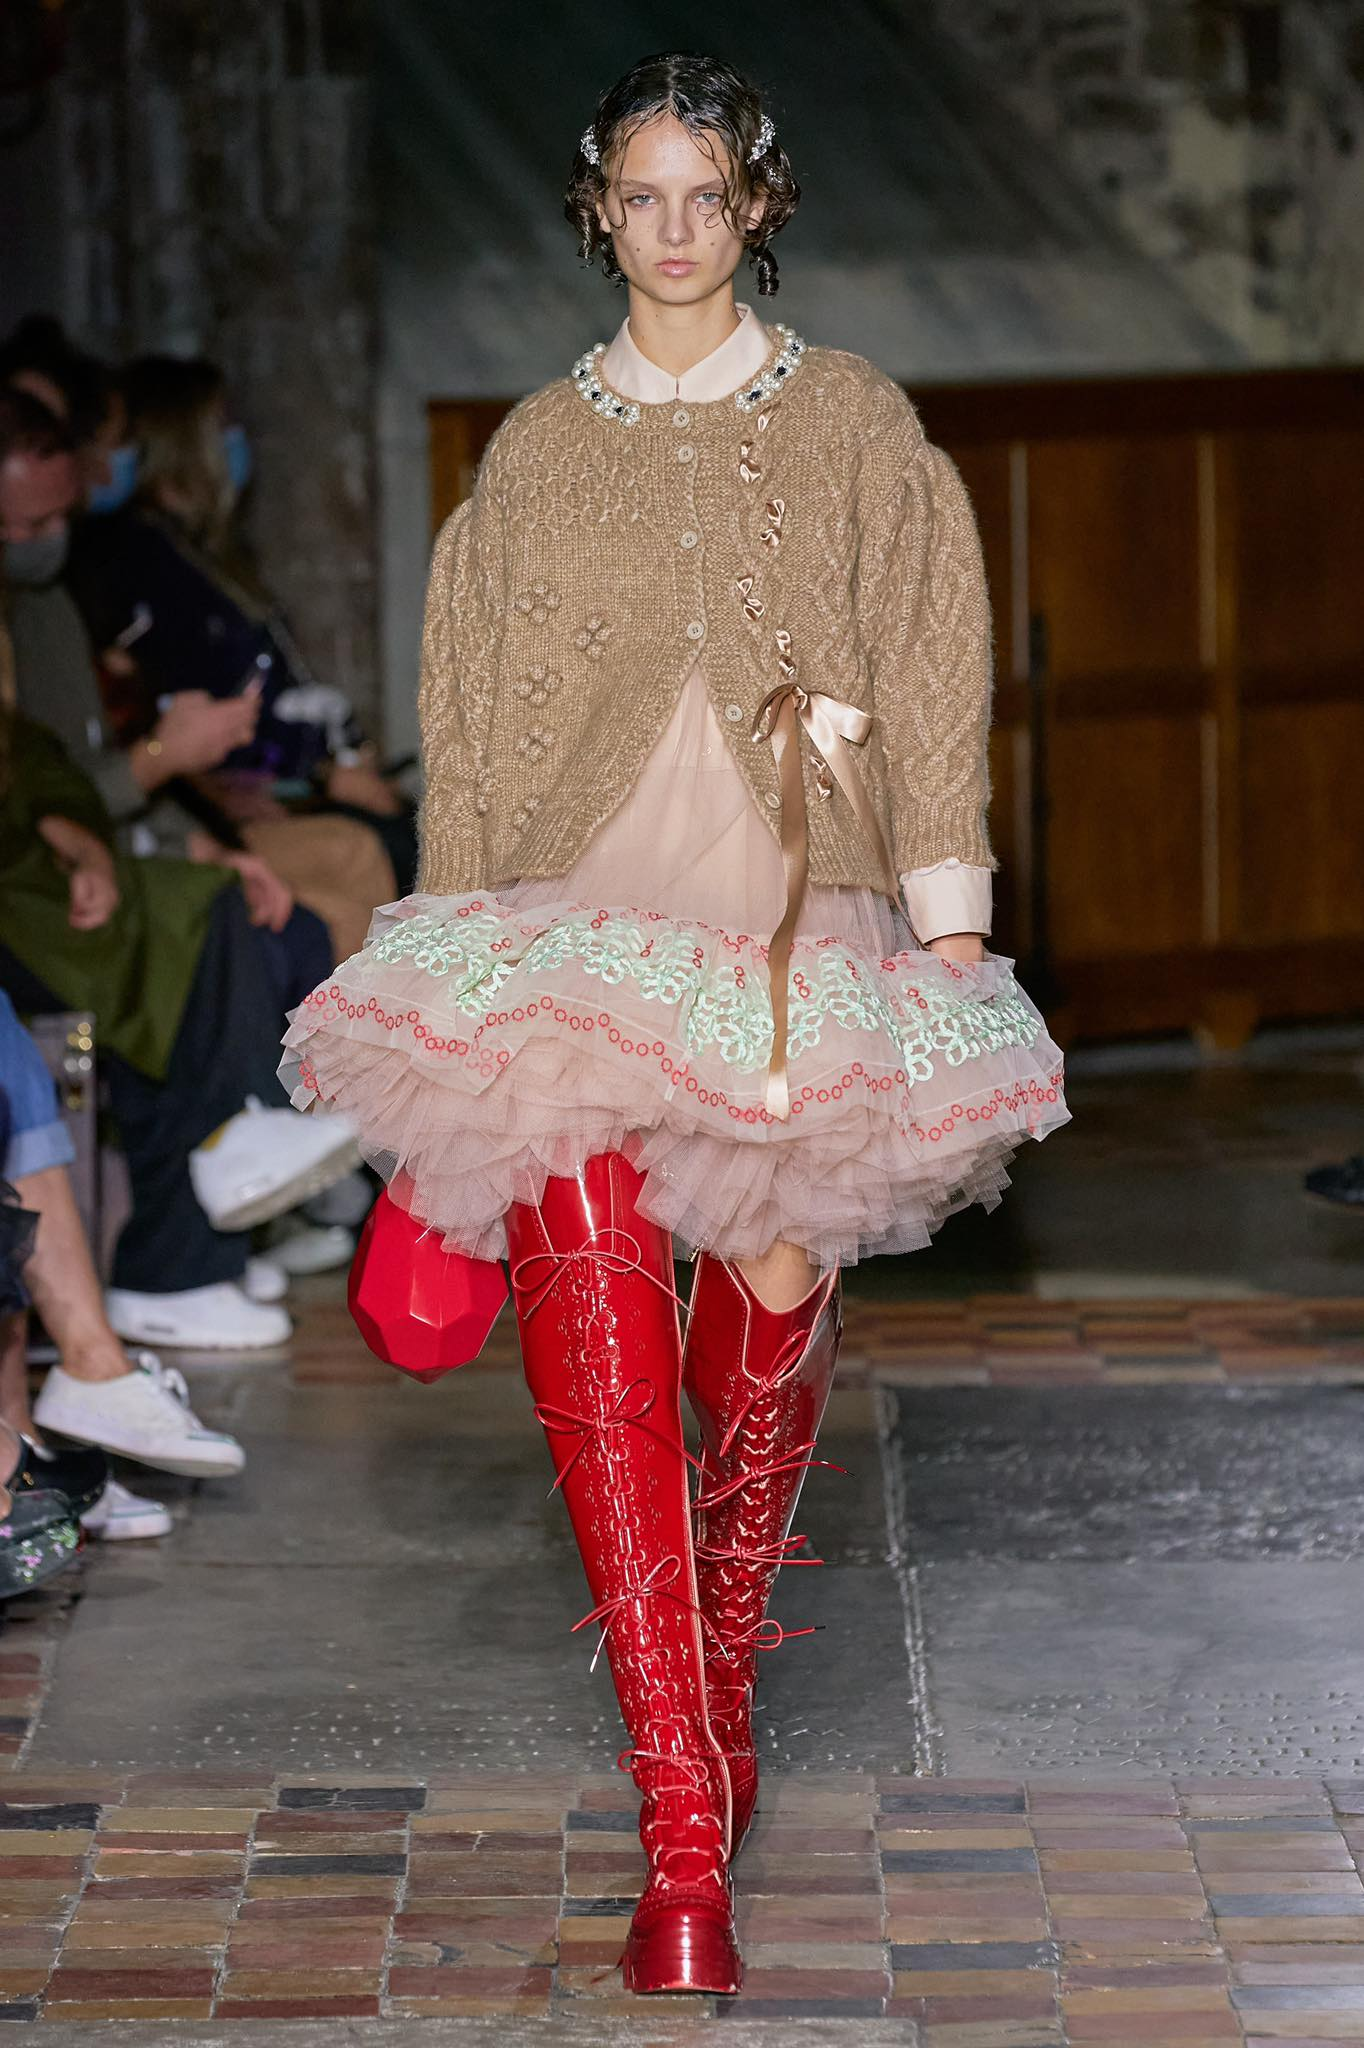 Simone Rocha thời trang xuân hè 2022 look1